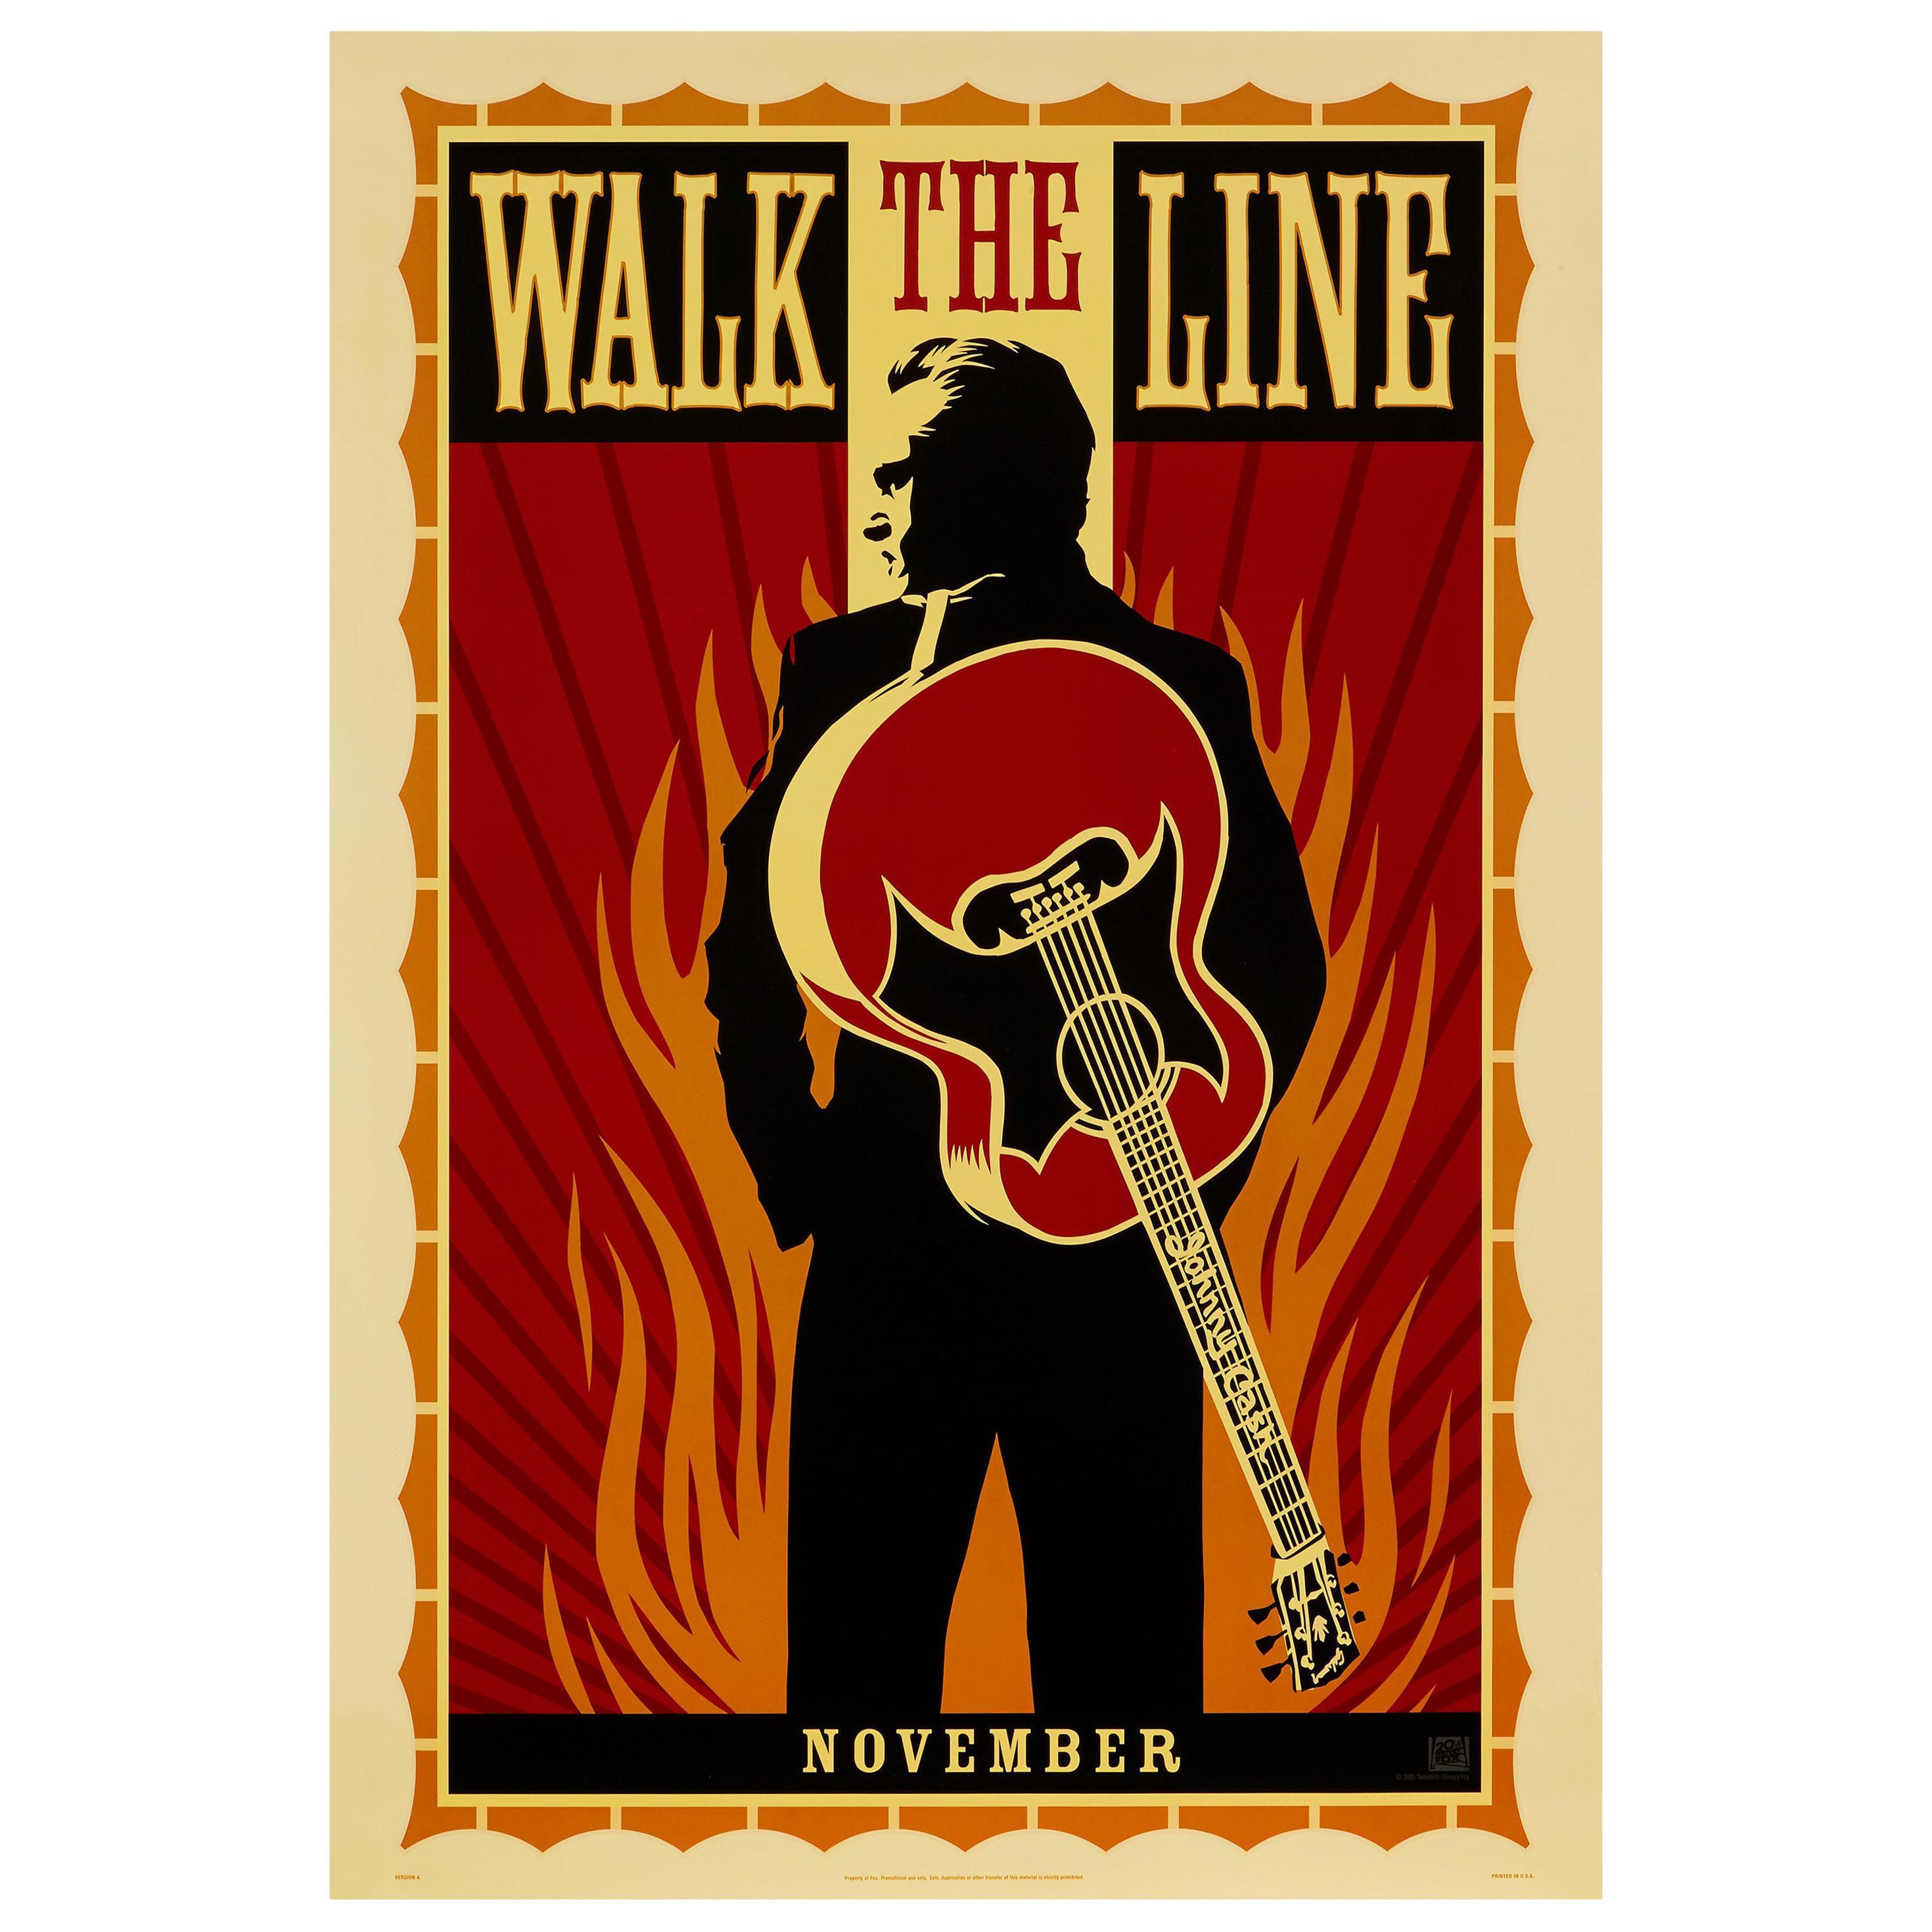 'Walk the Line' Original Vintage Movie Poster by Shepard Fairey, American, 2005